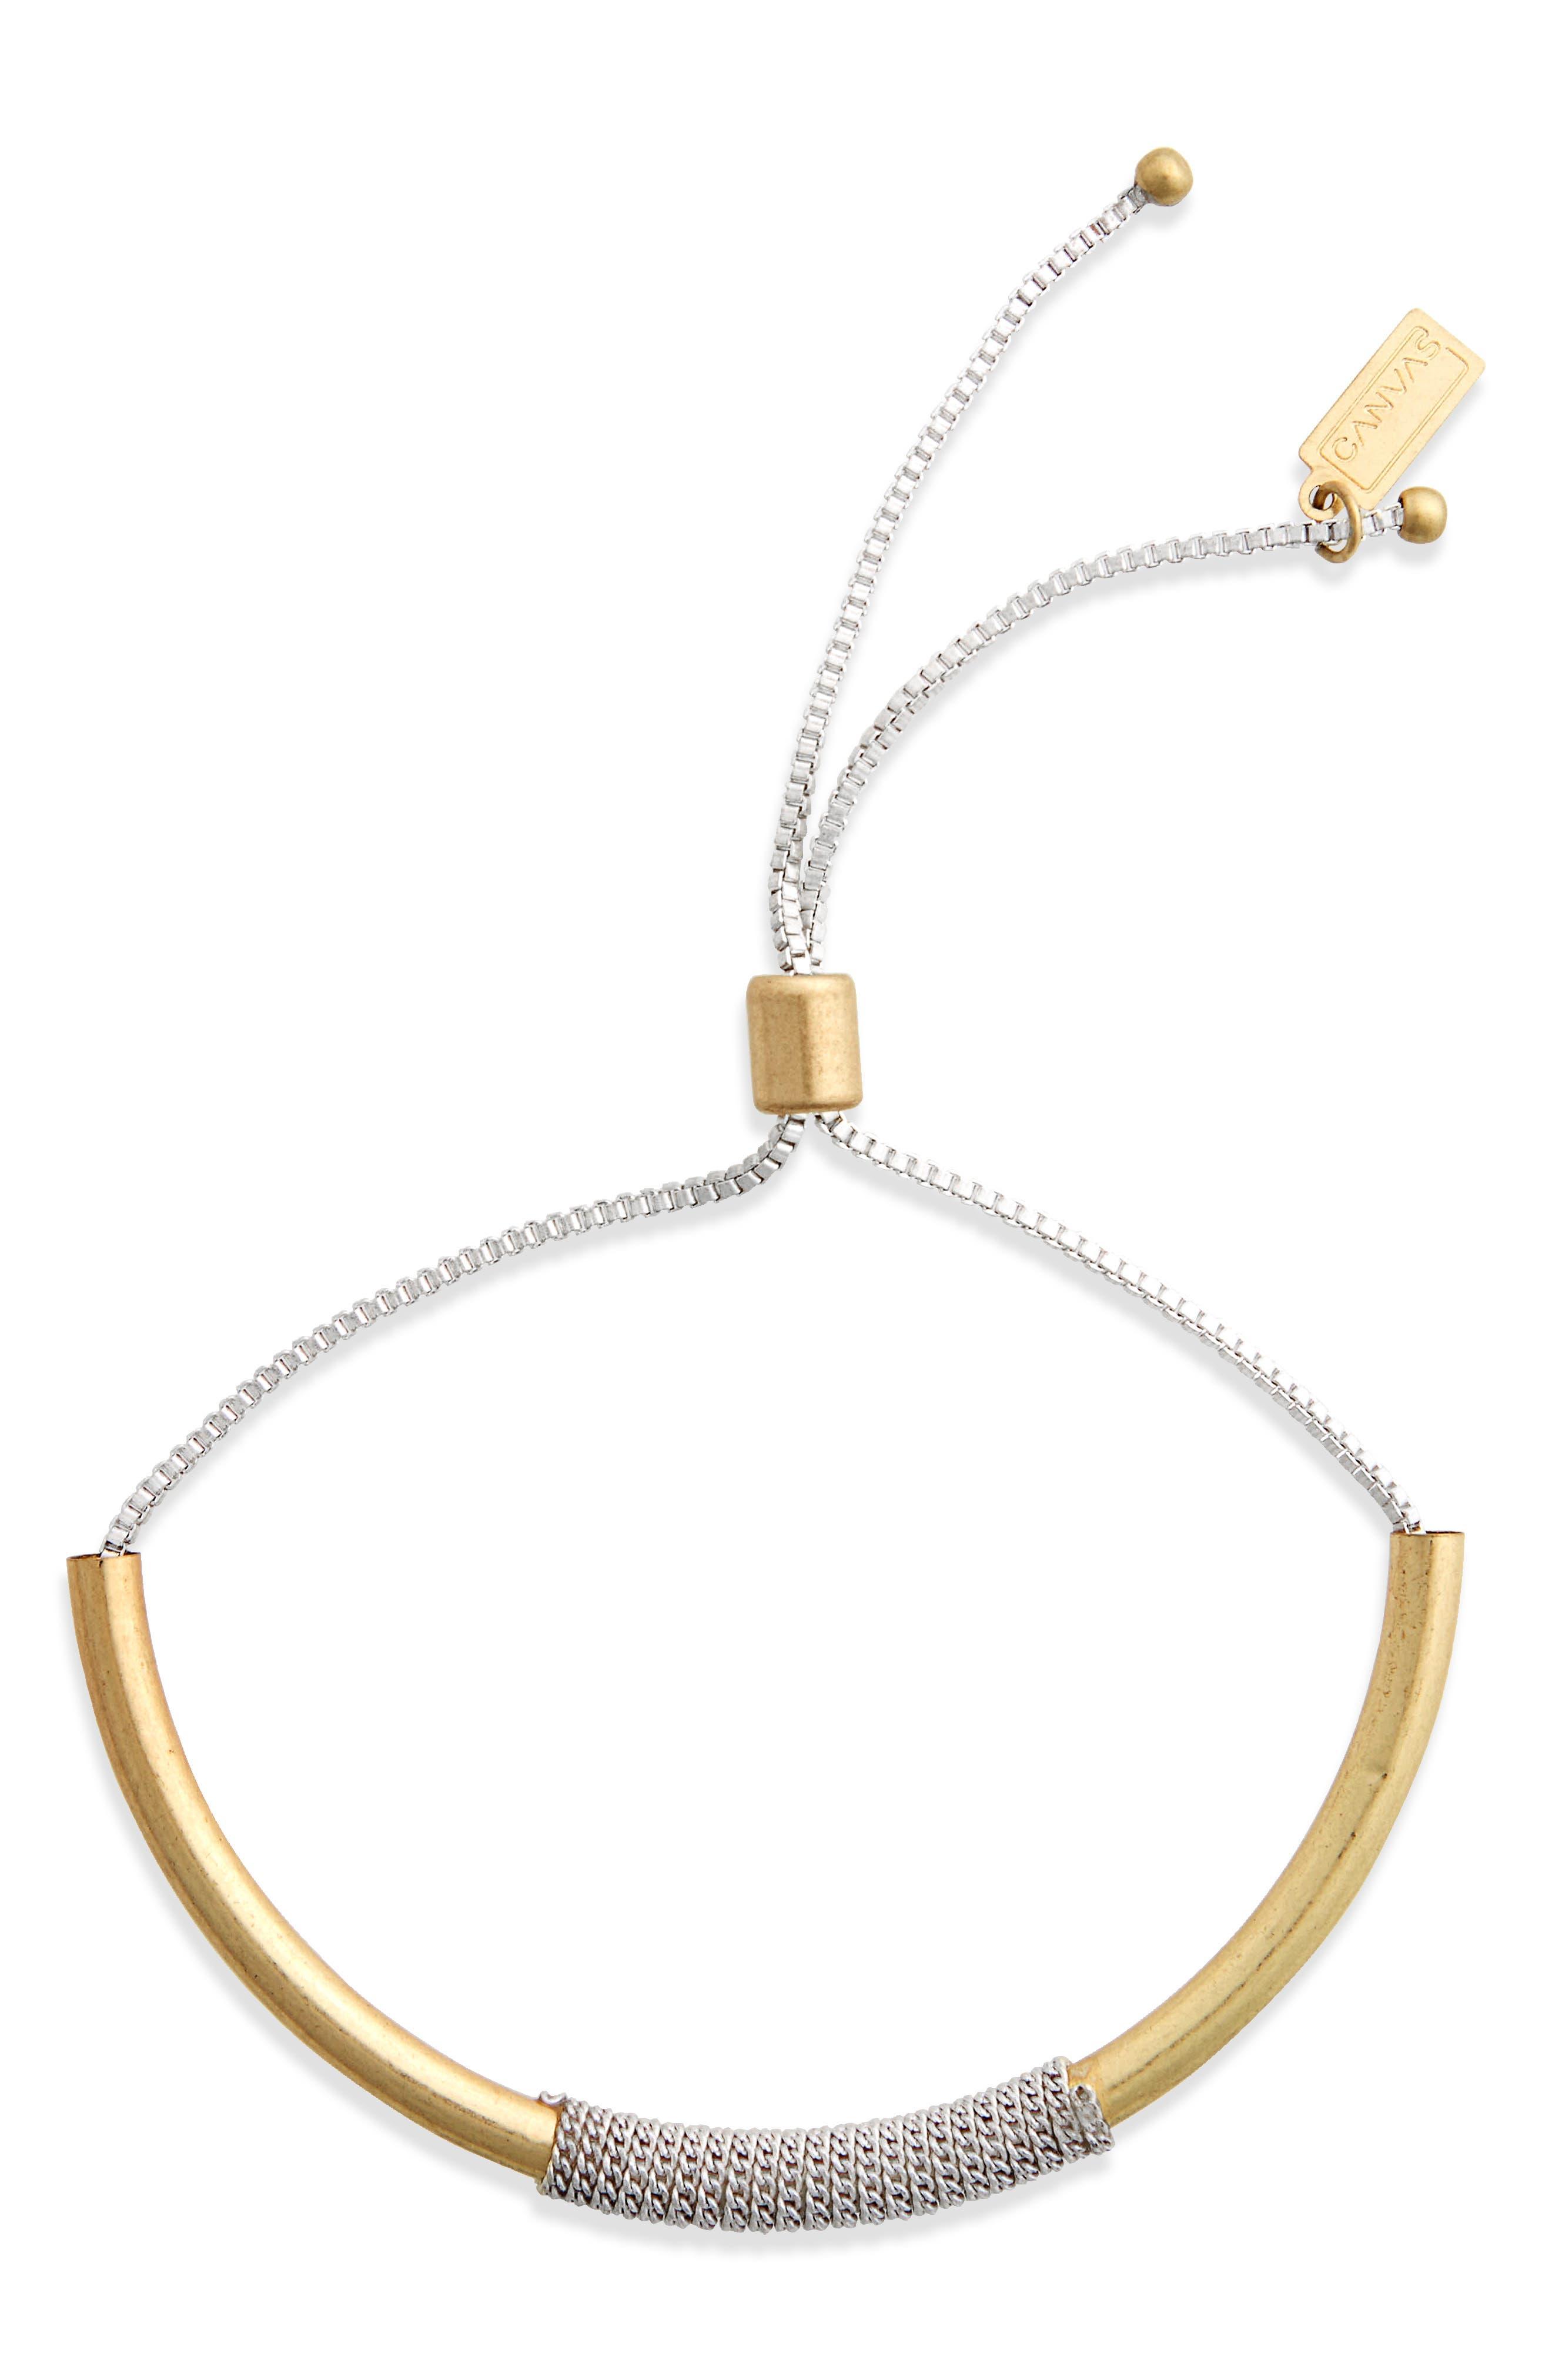 Chain & Metal Bar Bolo Bracelet,                             Main thumbnail 1, color,                             Two Tone